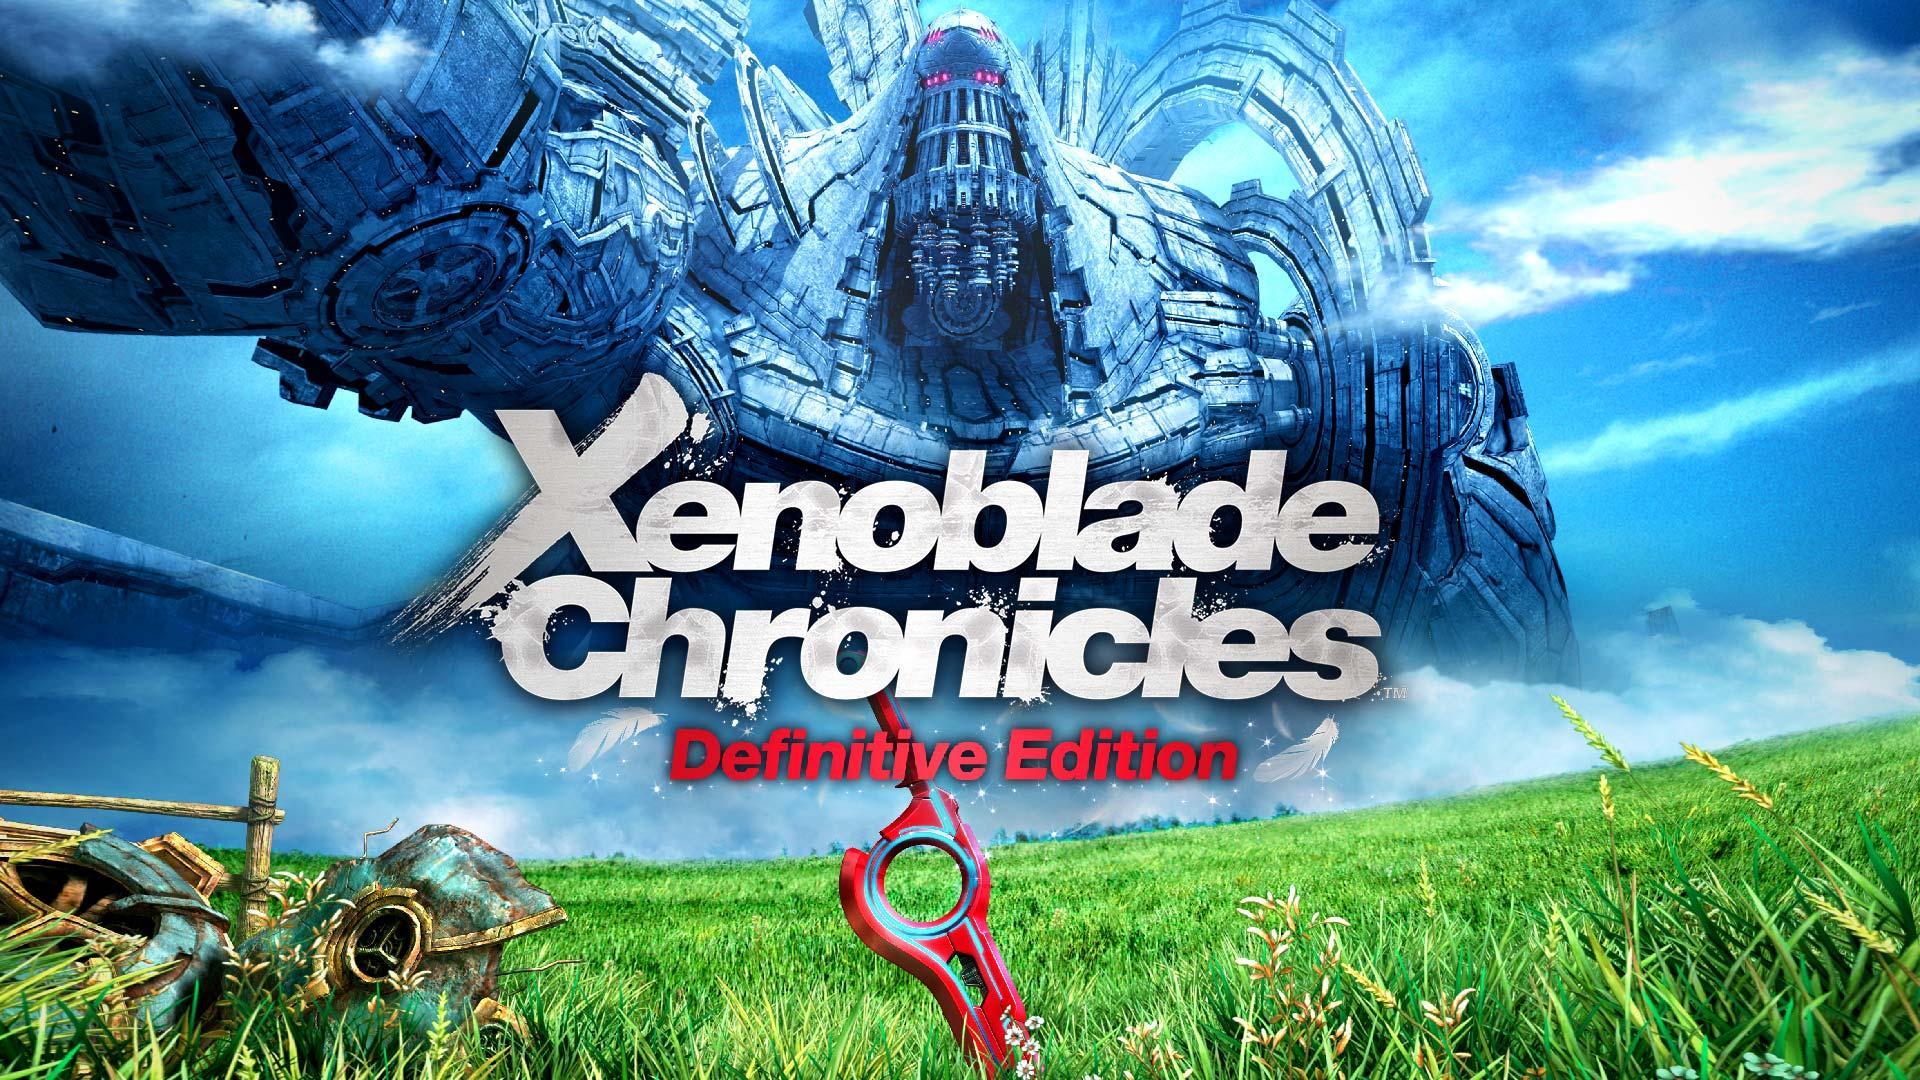 xenoblade chronicles, arts